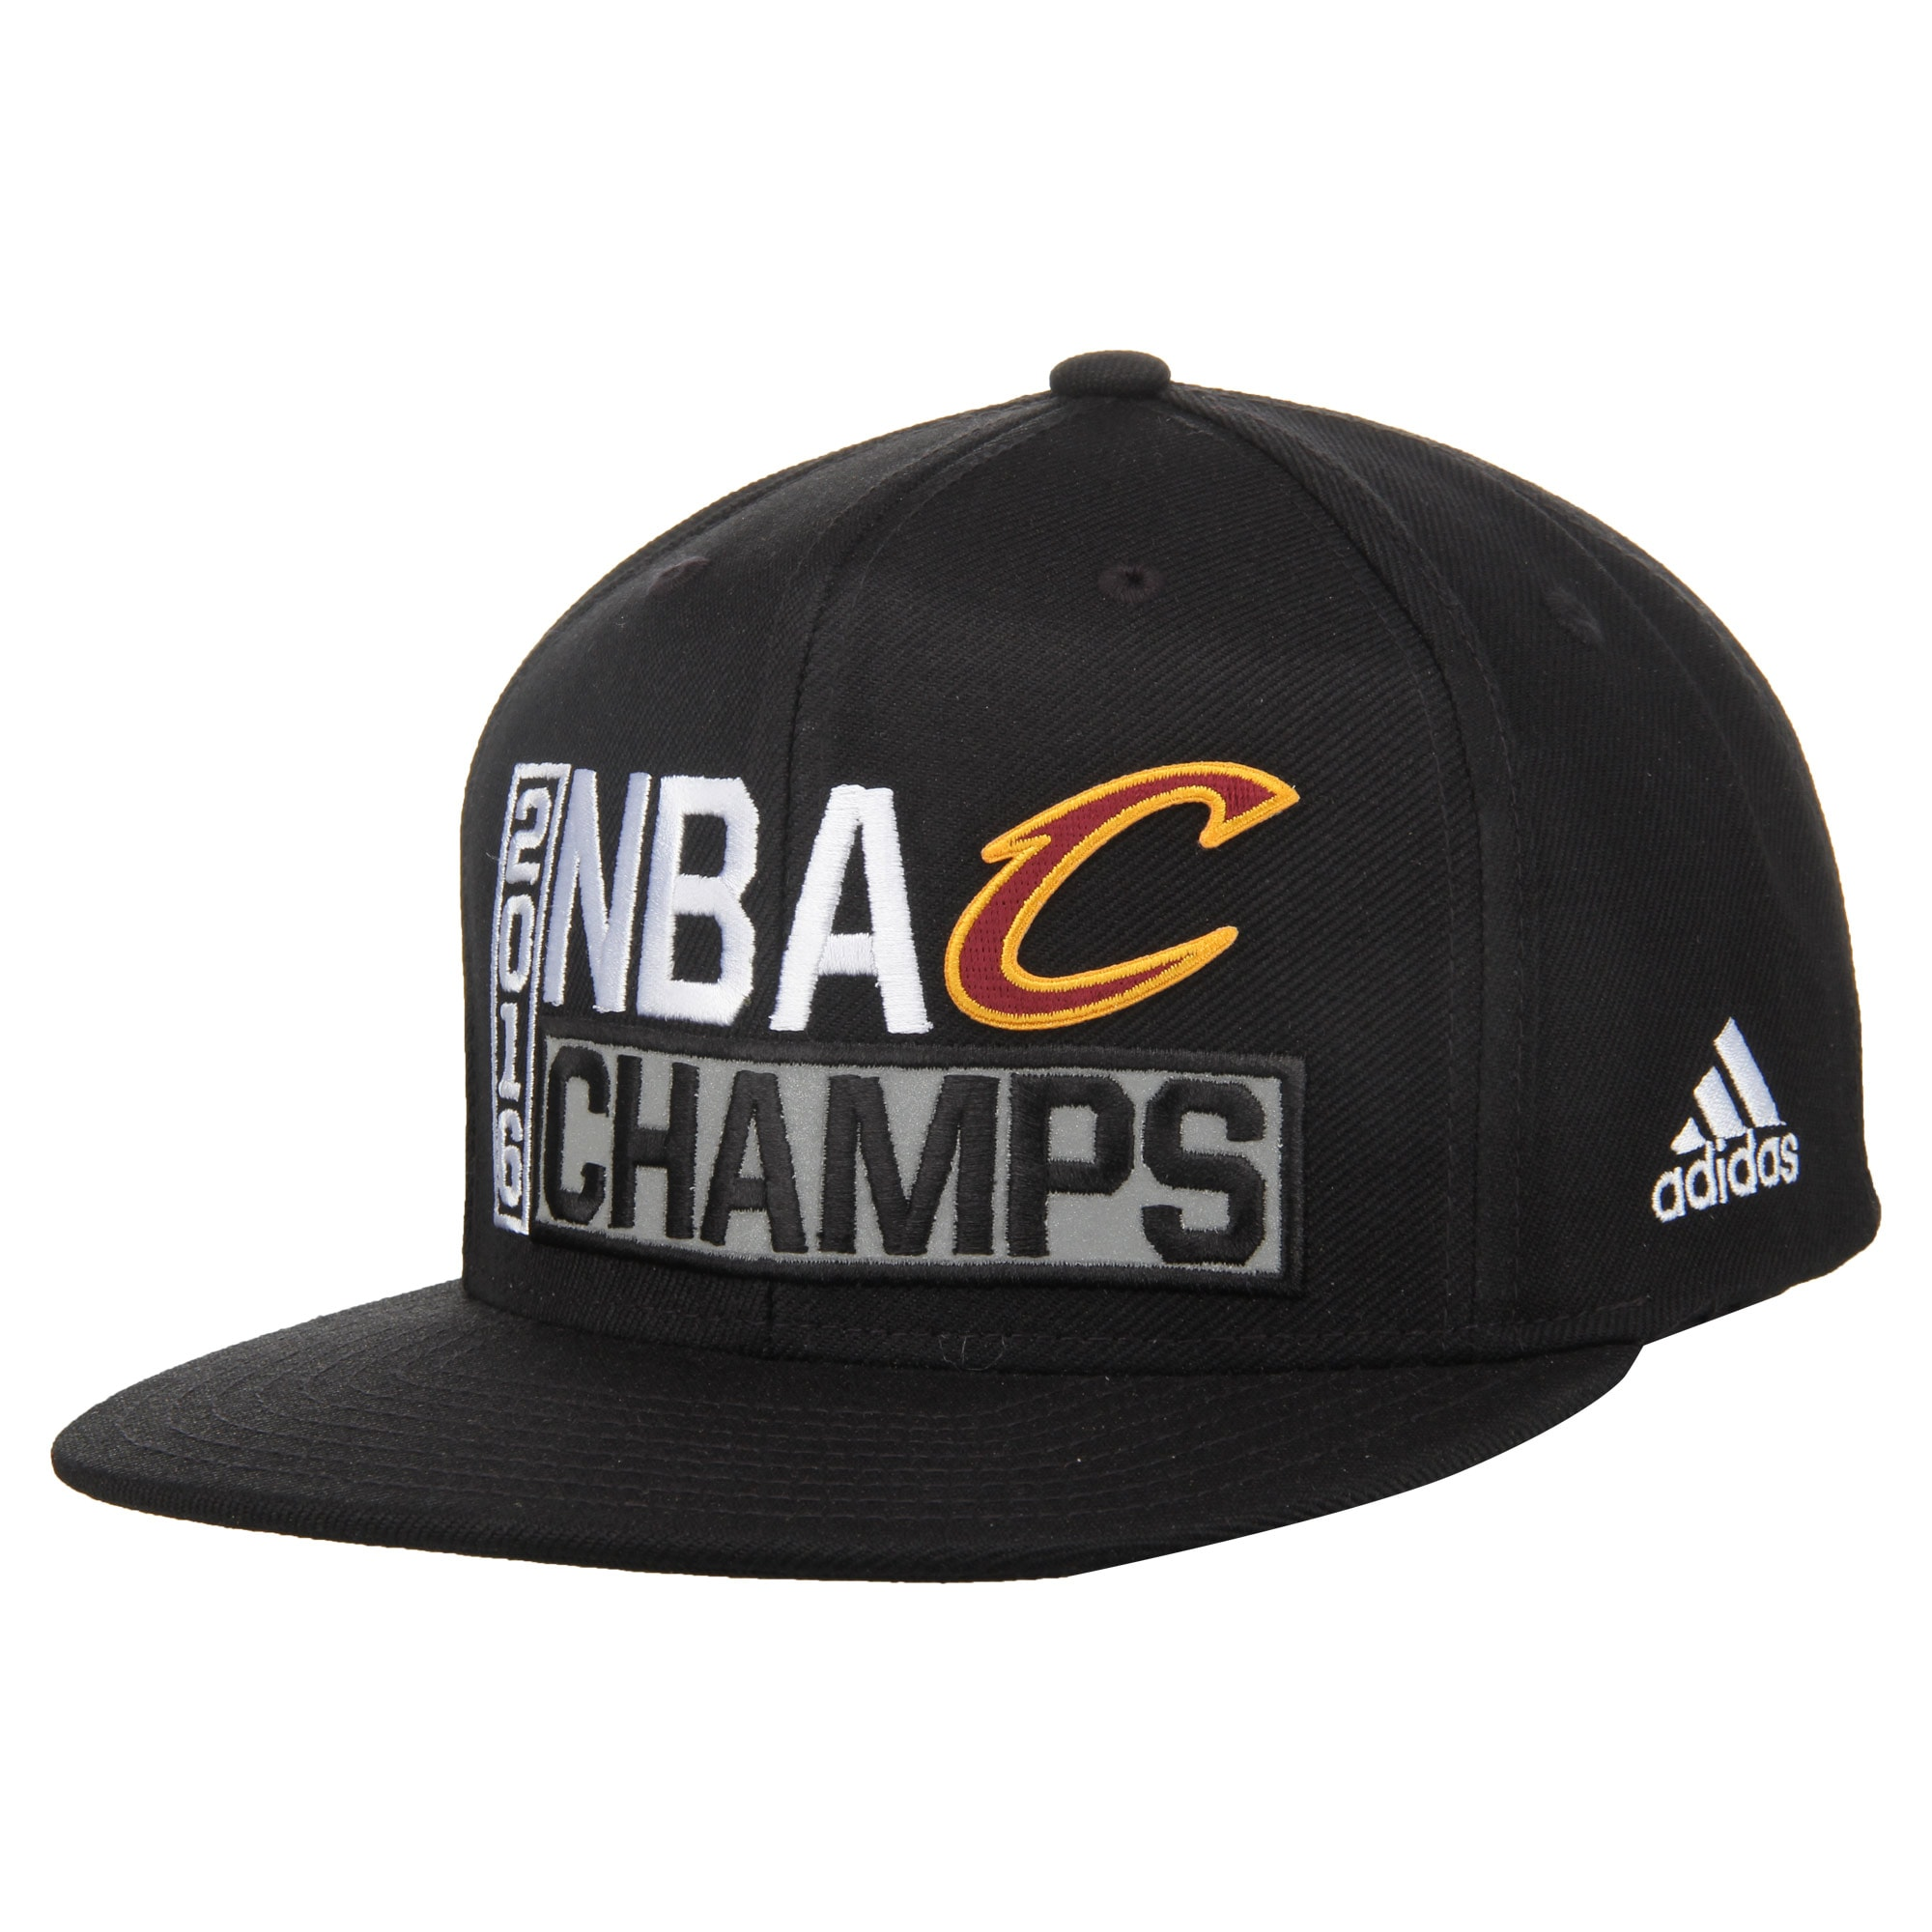 Cleveland Cavaliers adidas 2016 NBA Finals Champions Locker Room Snapback Adjustable Hat - Black